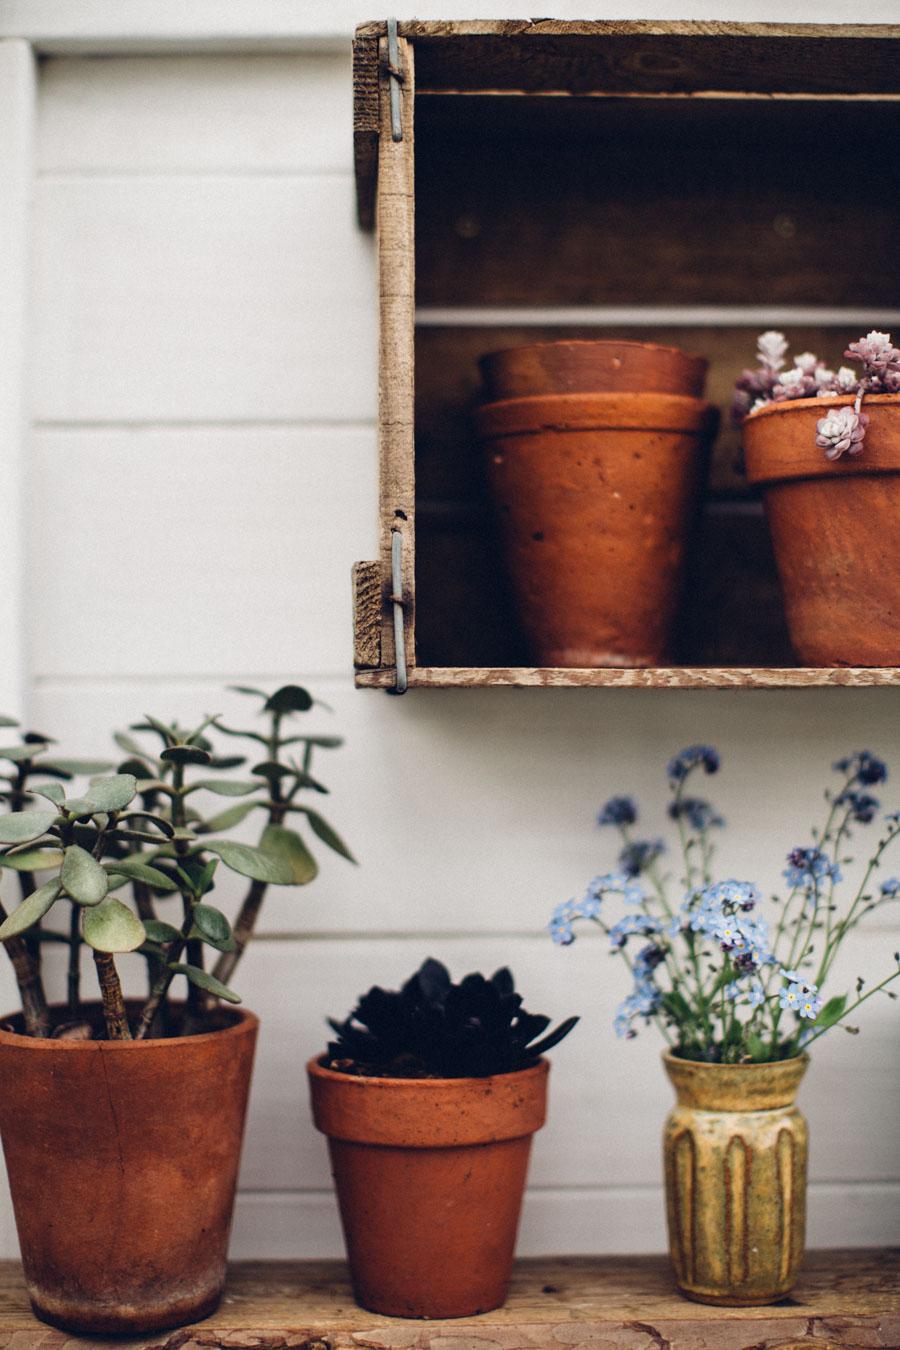 Vintage greenhouse style